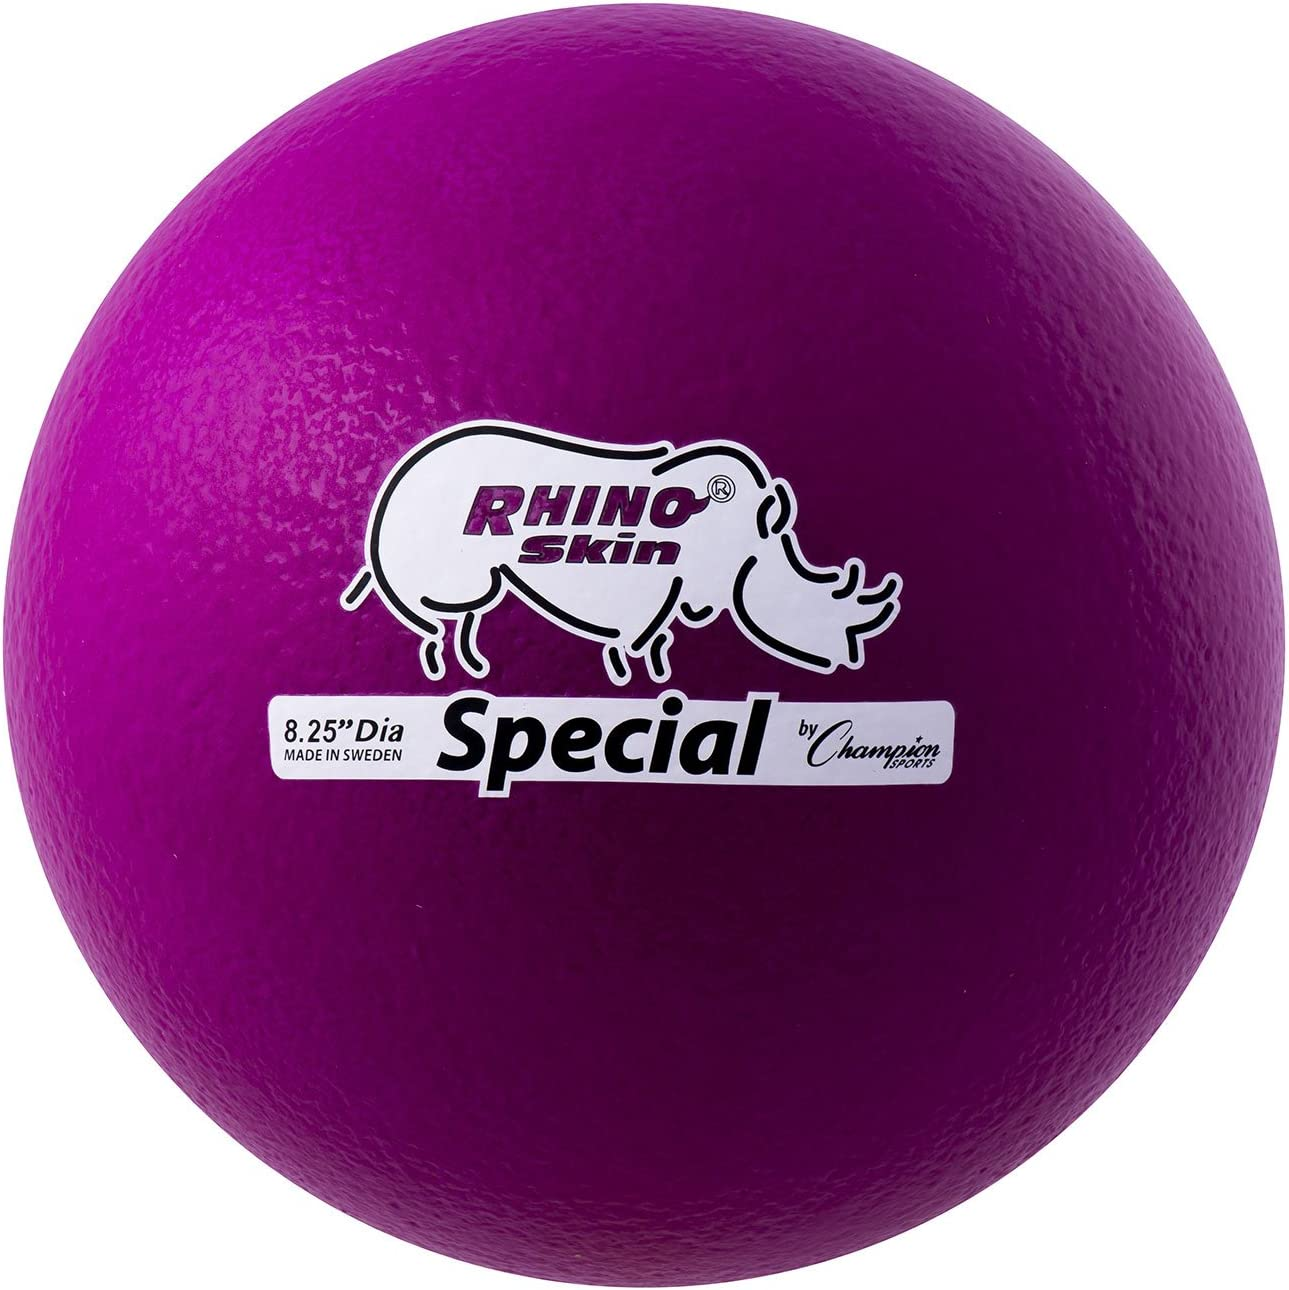 Champion Sports - Pelota Especial de Piel de Rinoceronte, Unisex ...